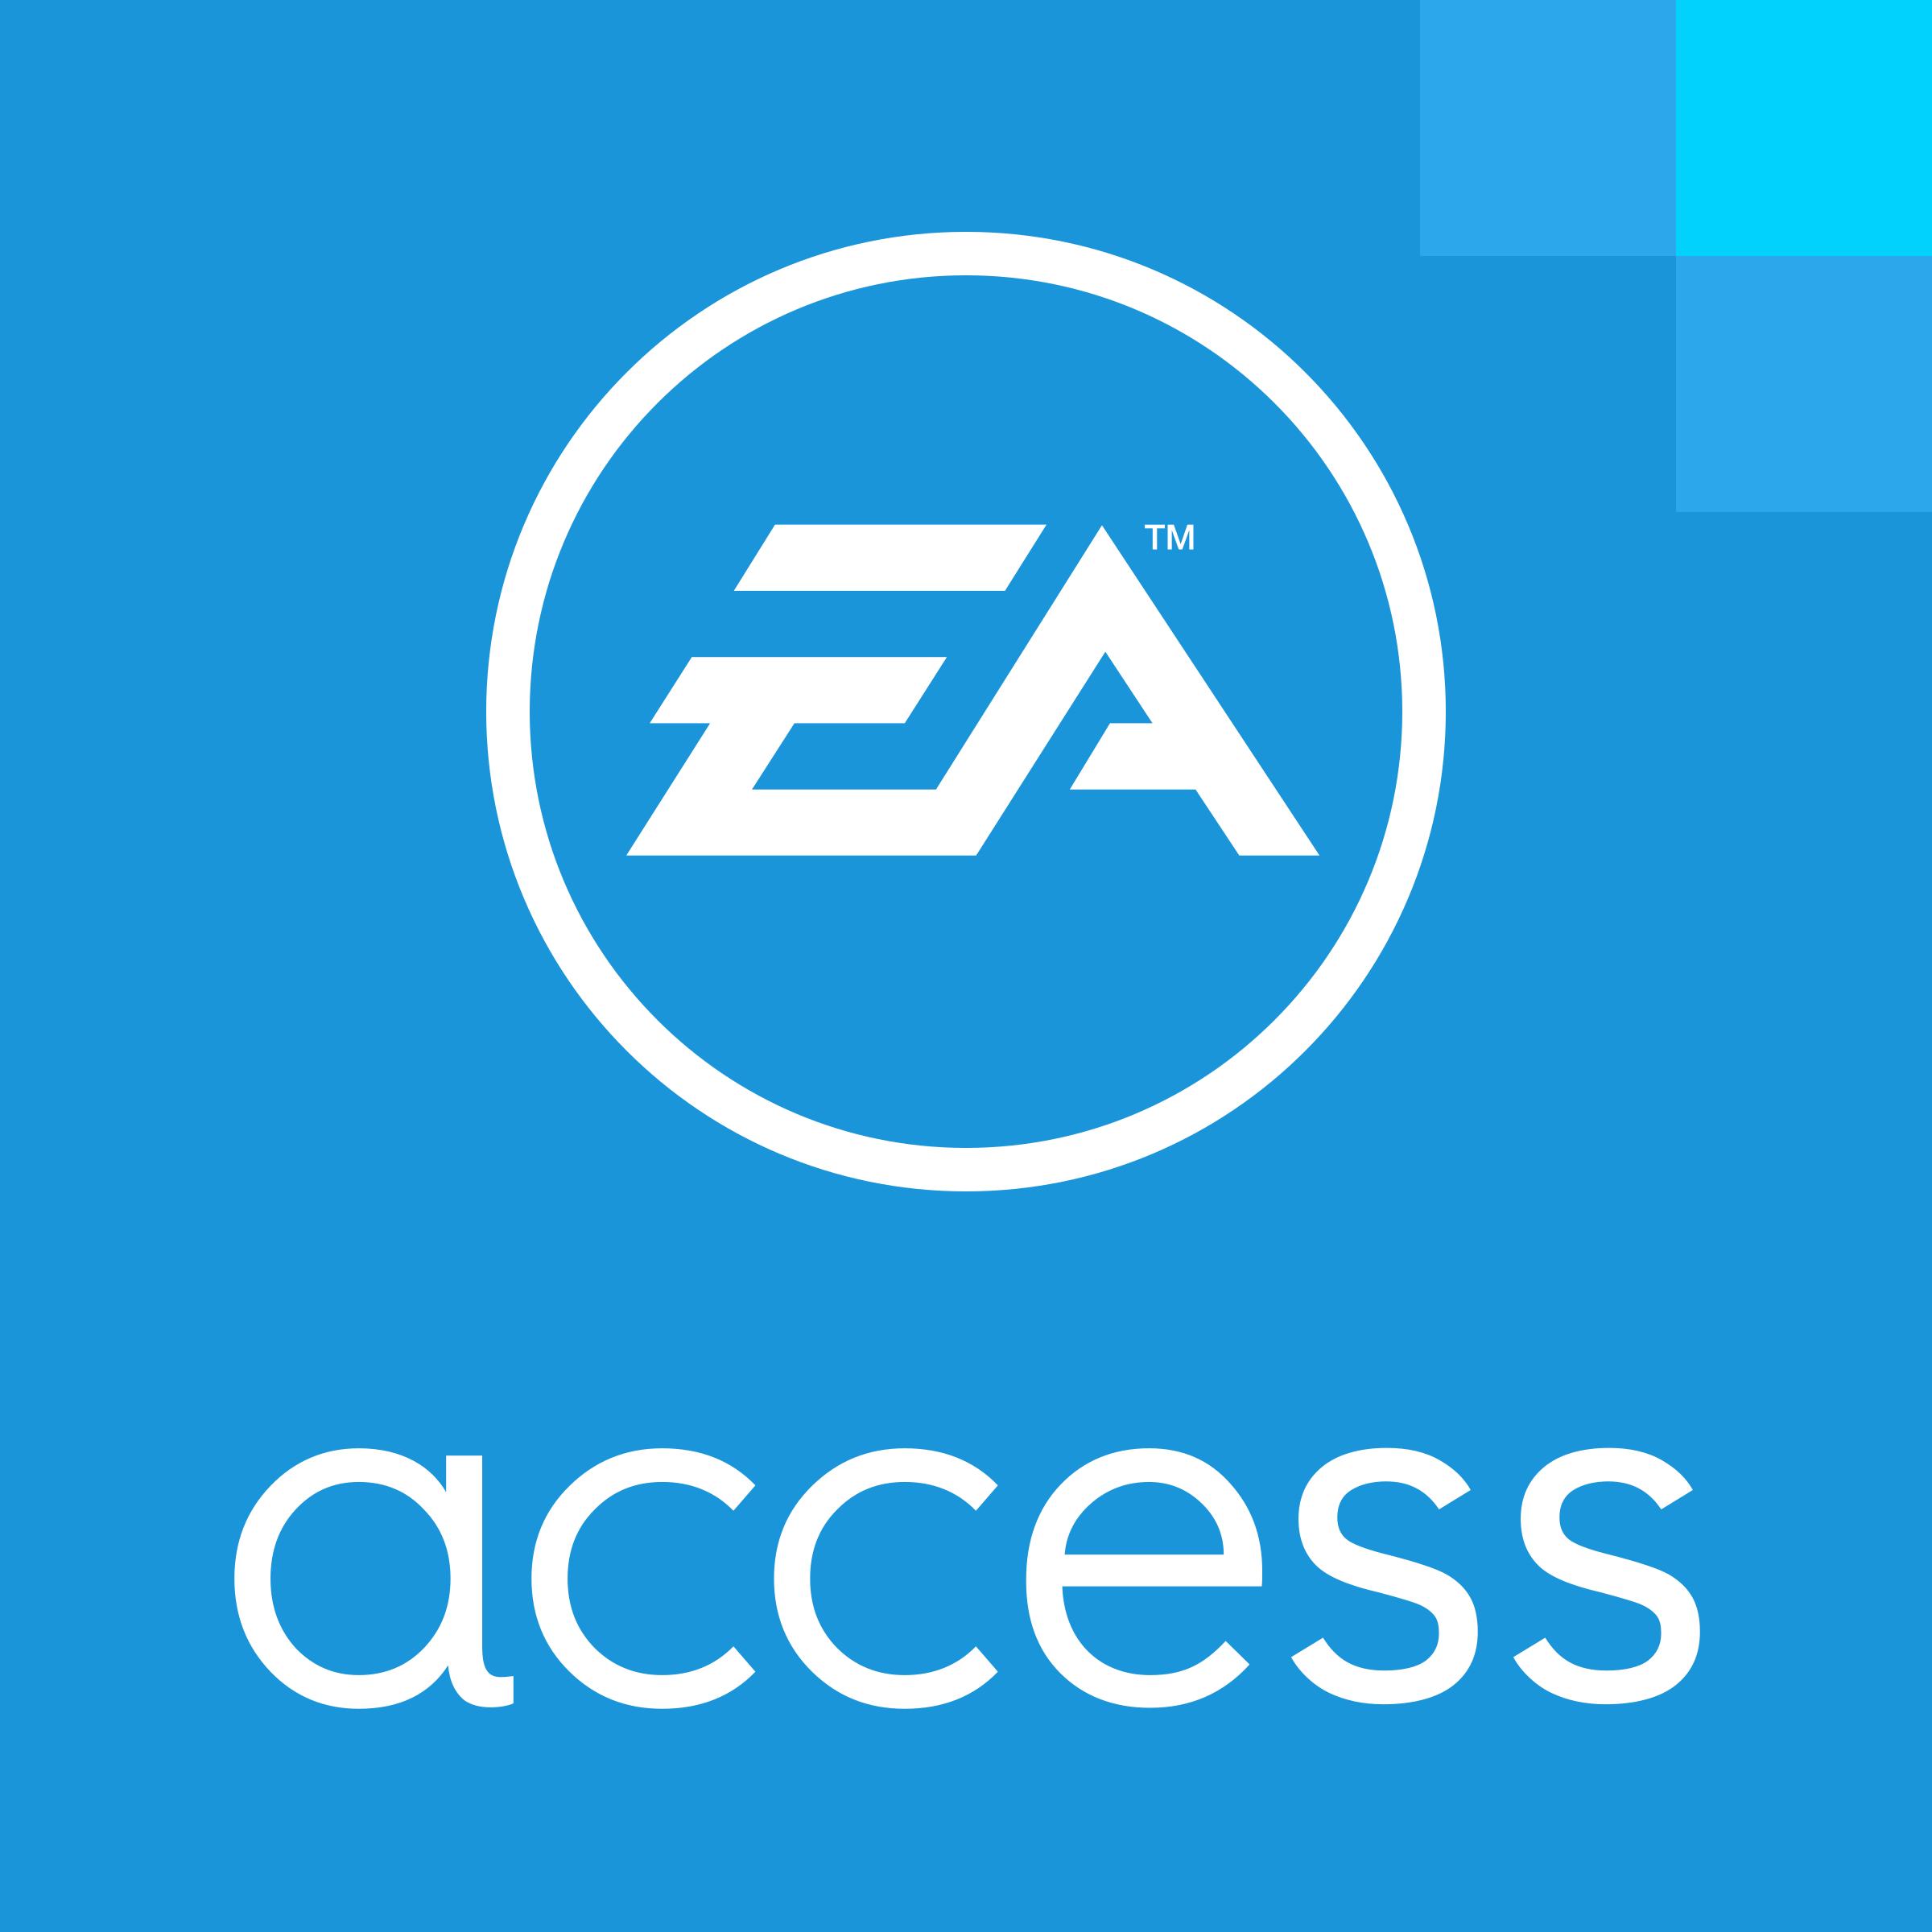 ea access logo png transparent & svg vector - freebie supply